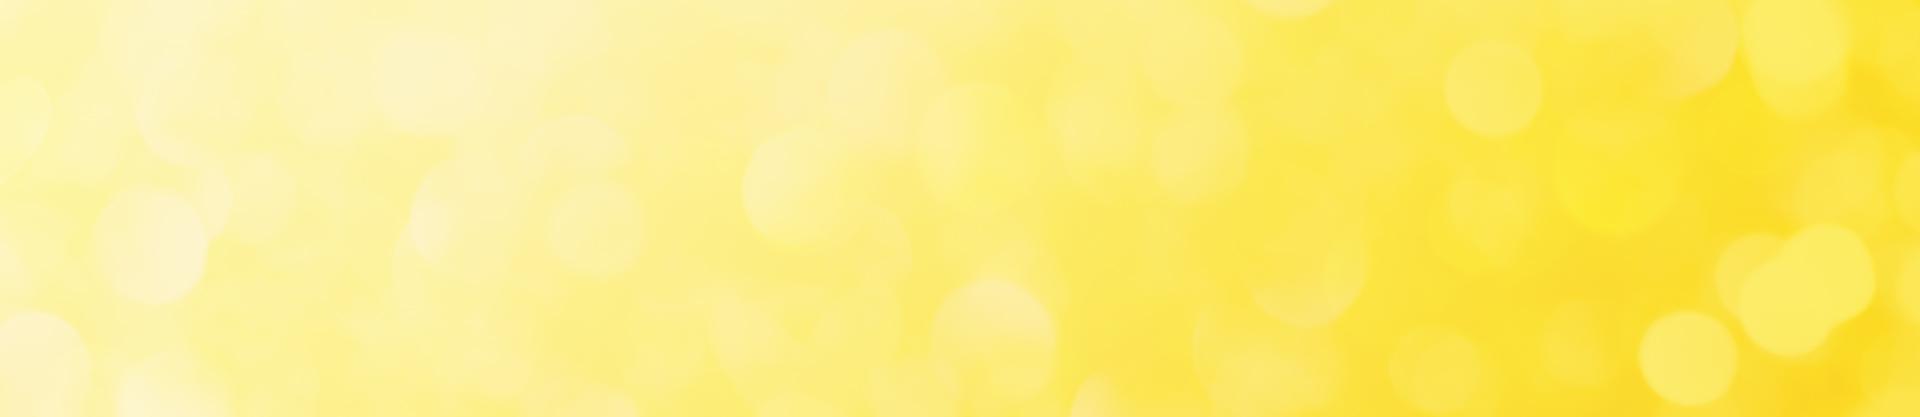 Decorative yellow banner